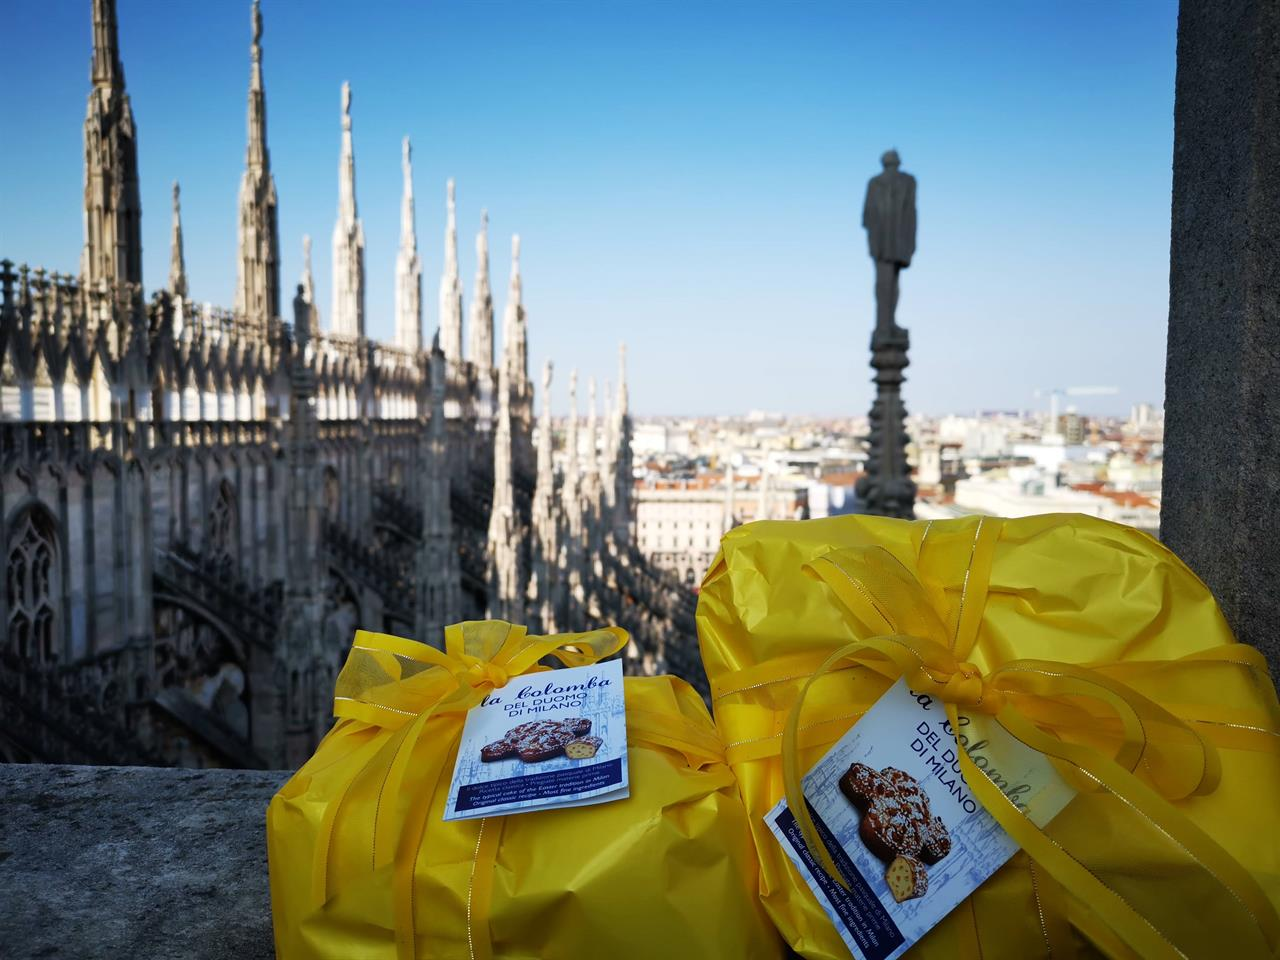 Colomba Duomo spring 2019